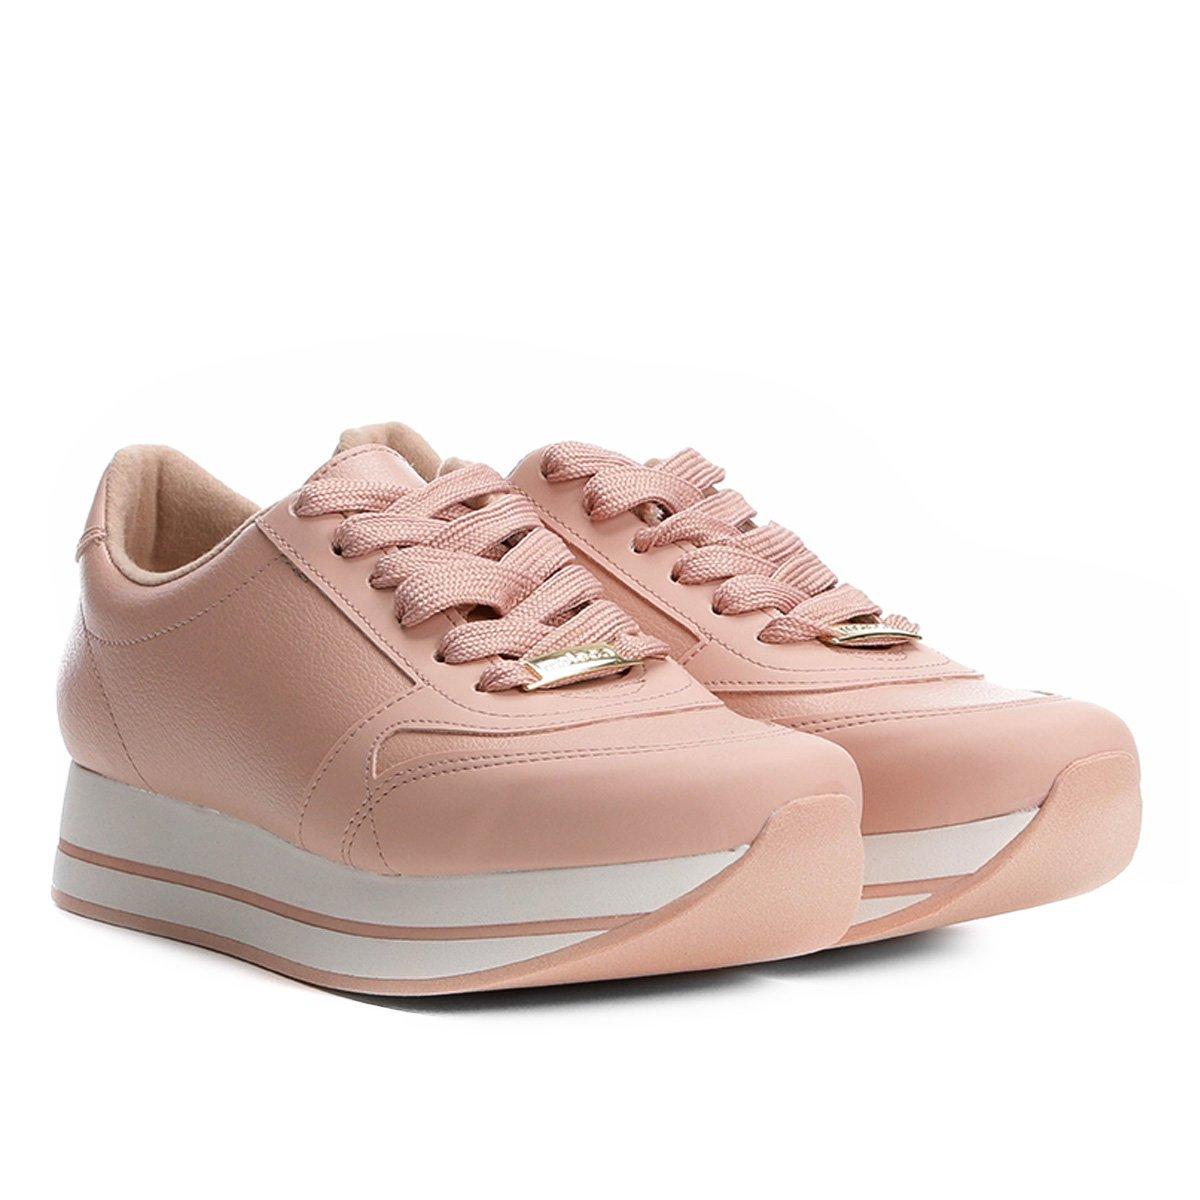 31a339b78140d Tênis Moleca Jogging Feminino - Rosa - Compre Agora   Zattini